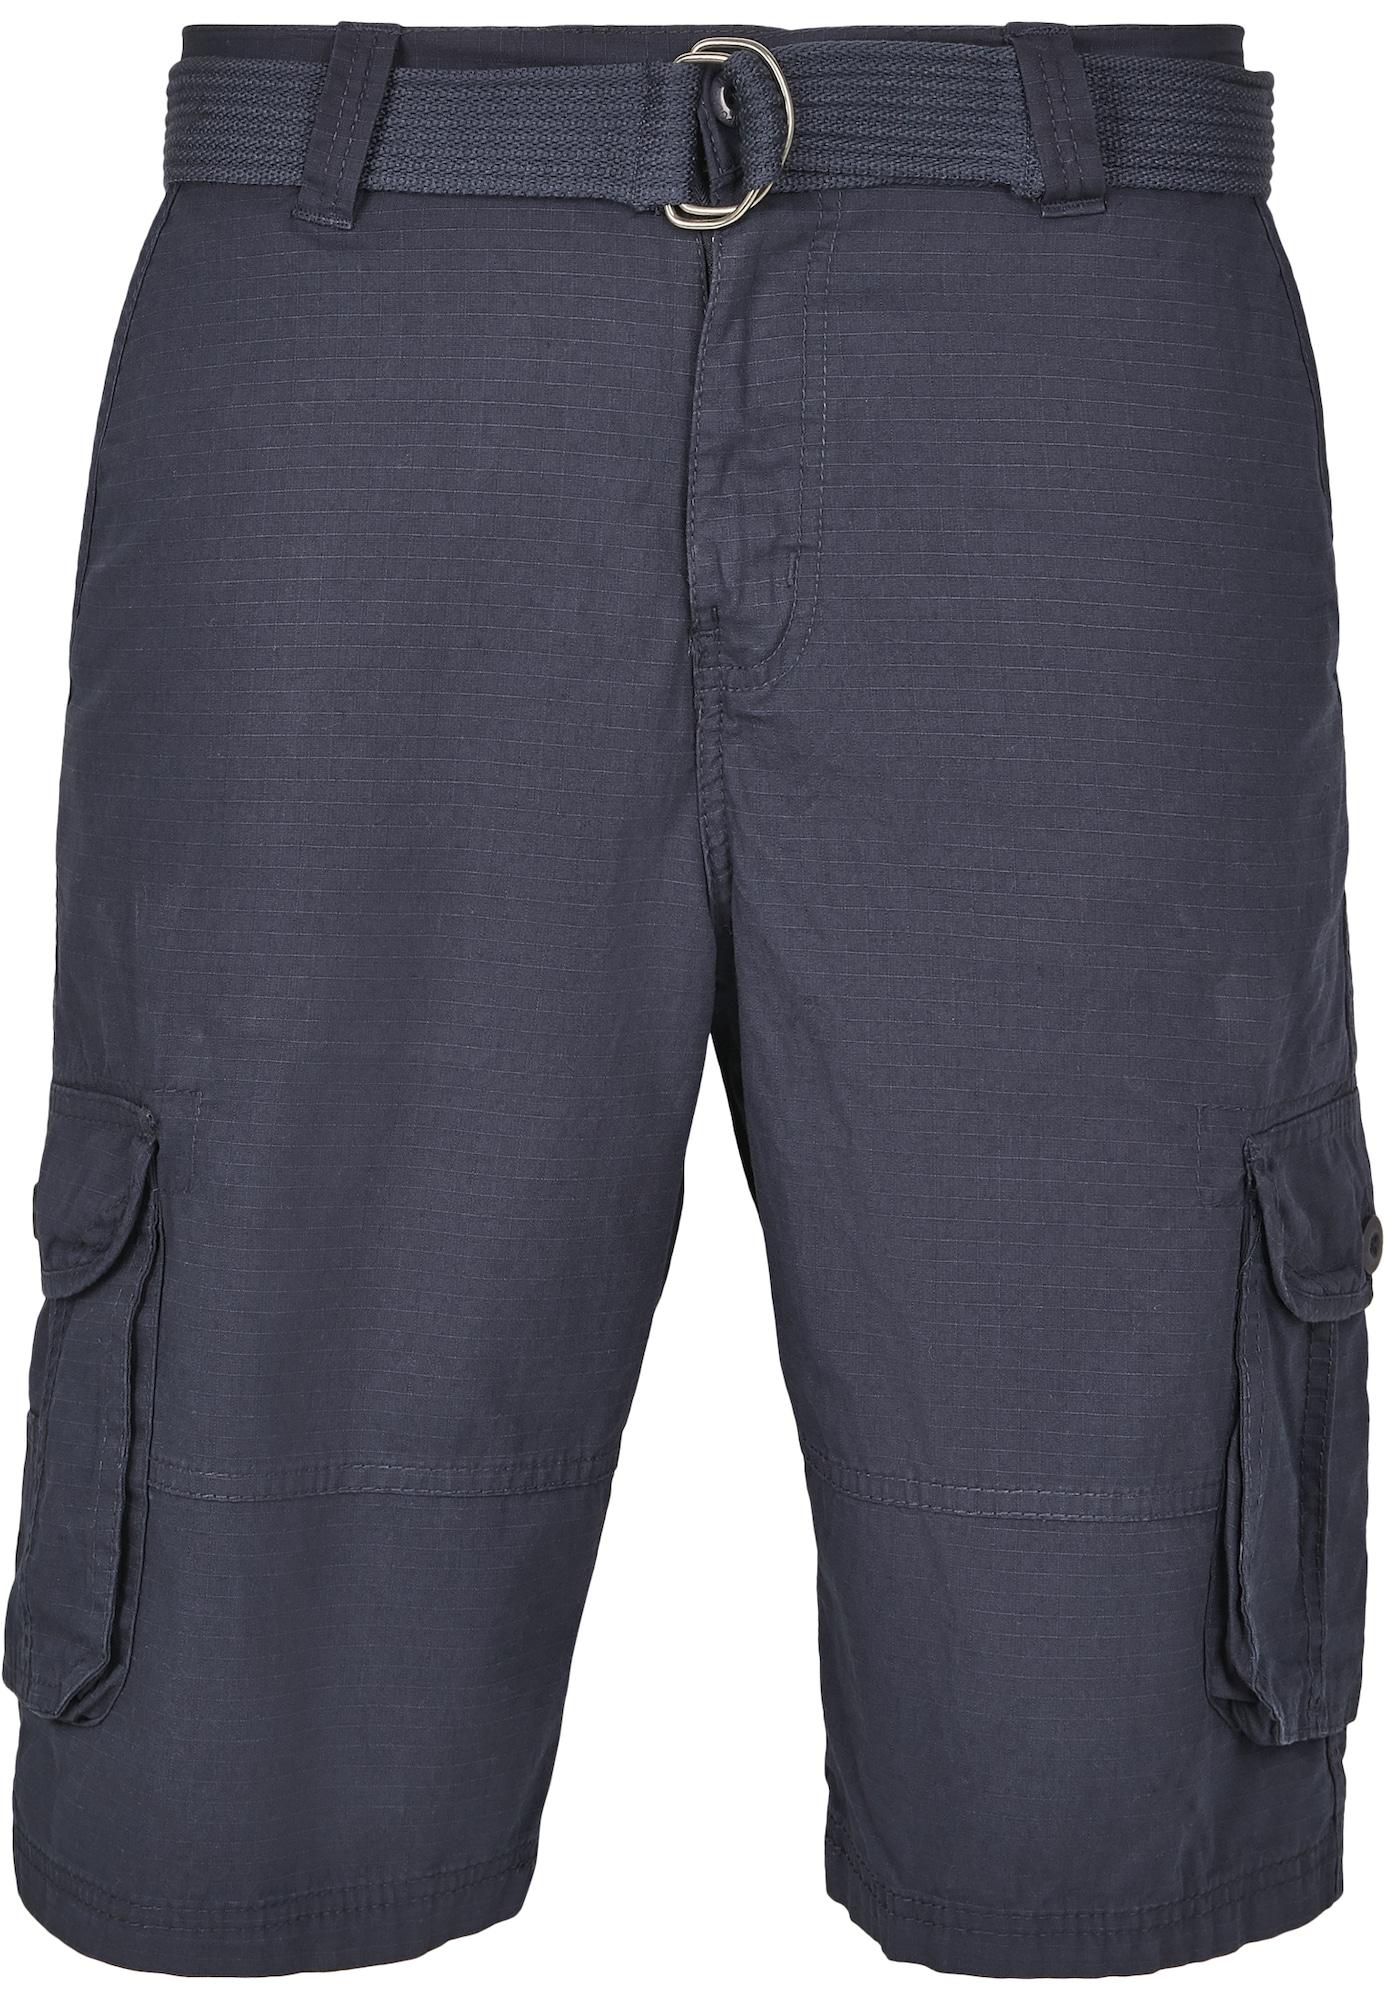 SOUTHPOLE Laisvo stiliaus kelnės tamsiai mėlyna